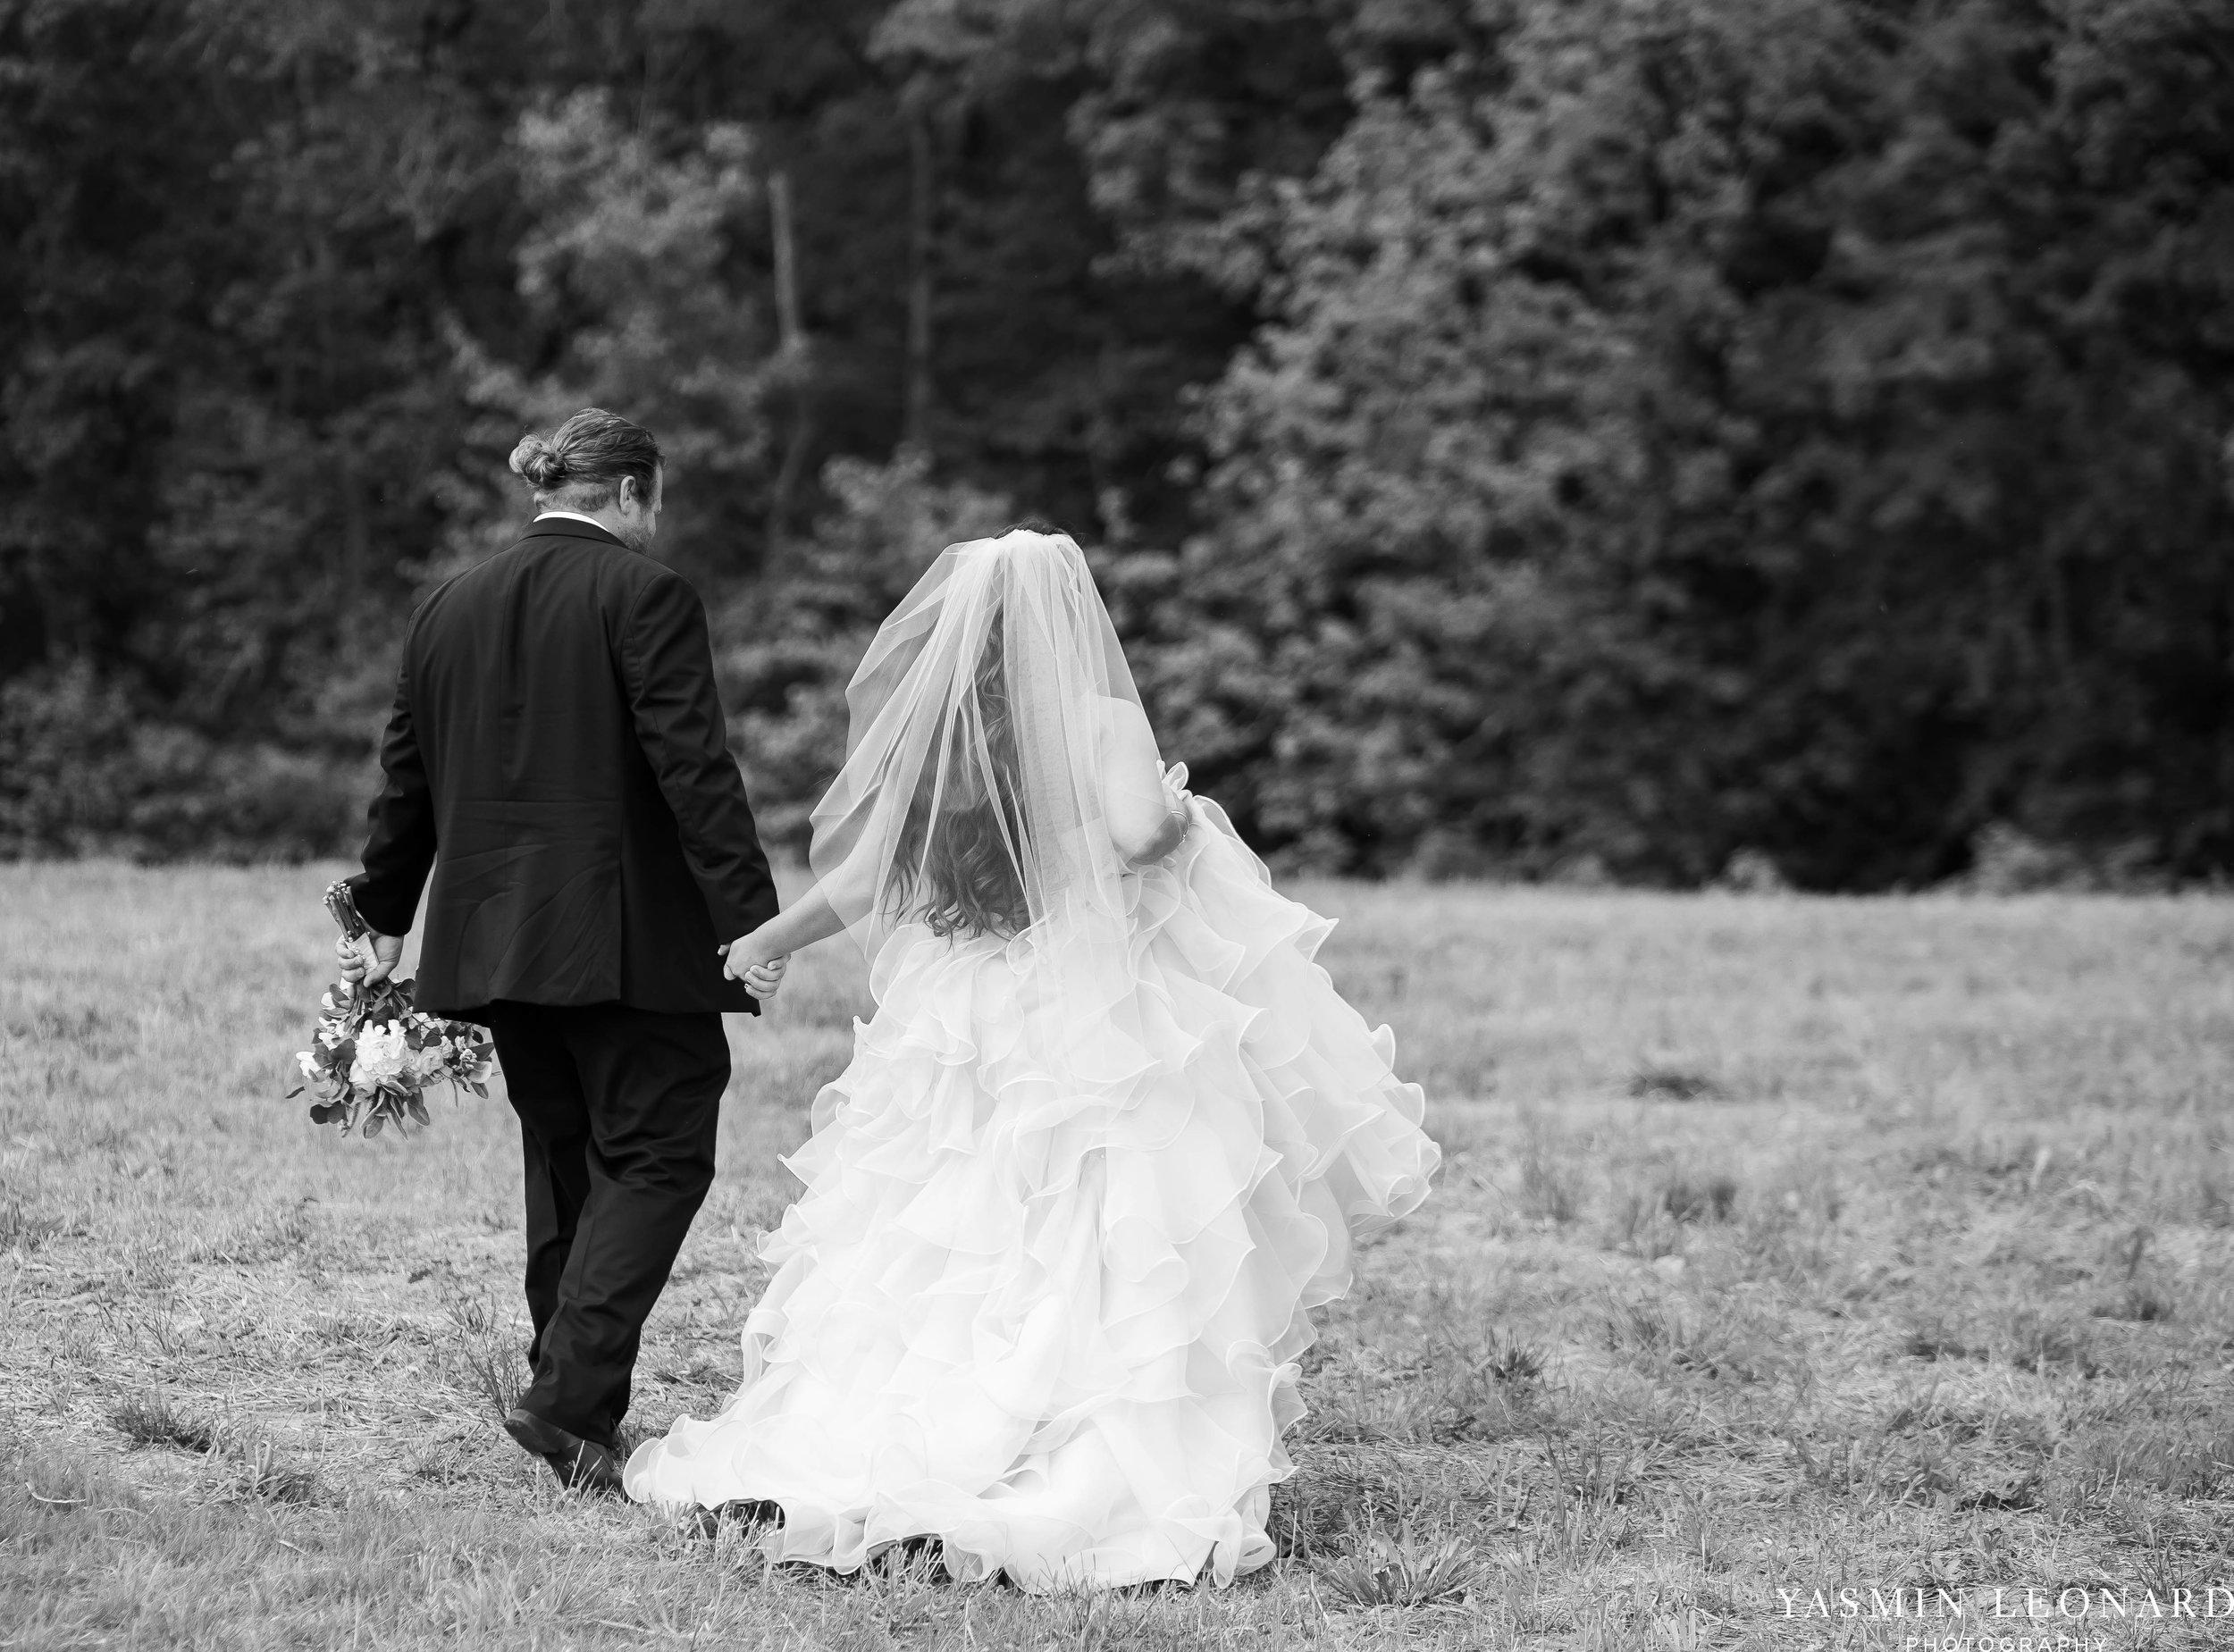 Rain on your wedding day - Rainy Wedding - Plan B for Rain - What to do if it rains on your wedding day - Wedding Inspiration - Outdoor wedding ideas - Rainy Wedding Pictures - Yasmin Leonard Photography-39.jpg